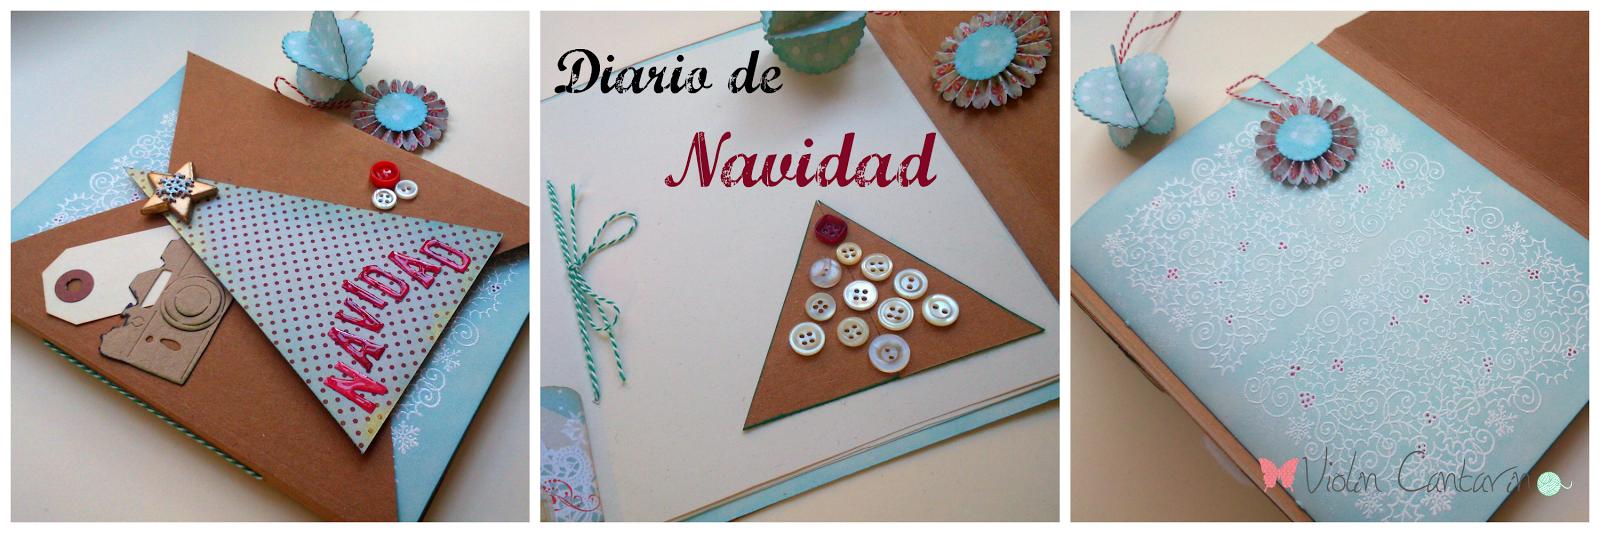 Taller, scrapbook, Granada, manualidades, Violín Cantarín